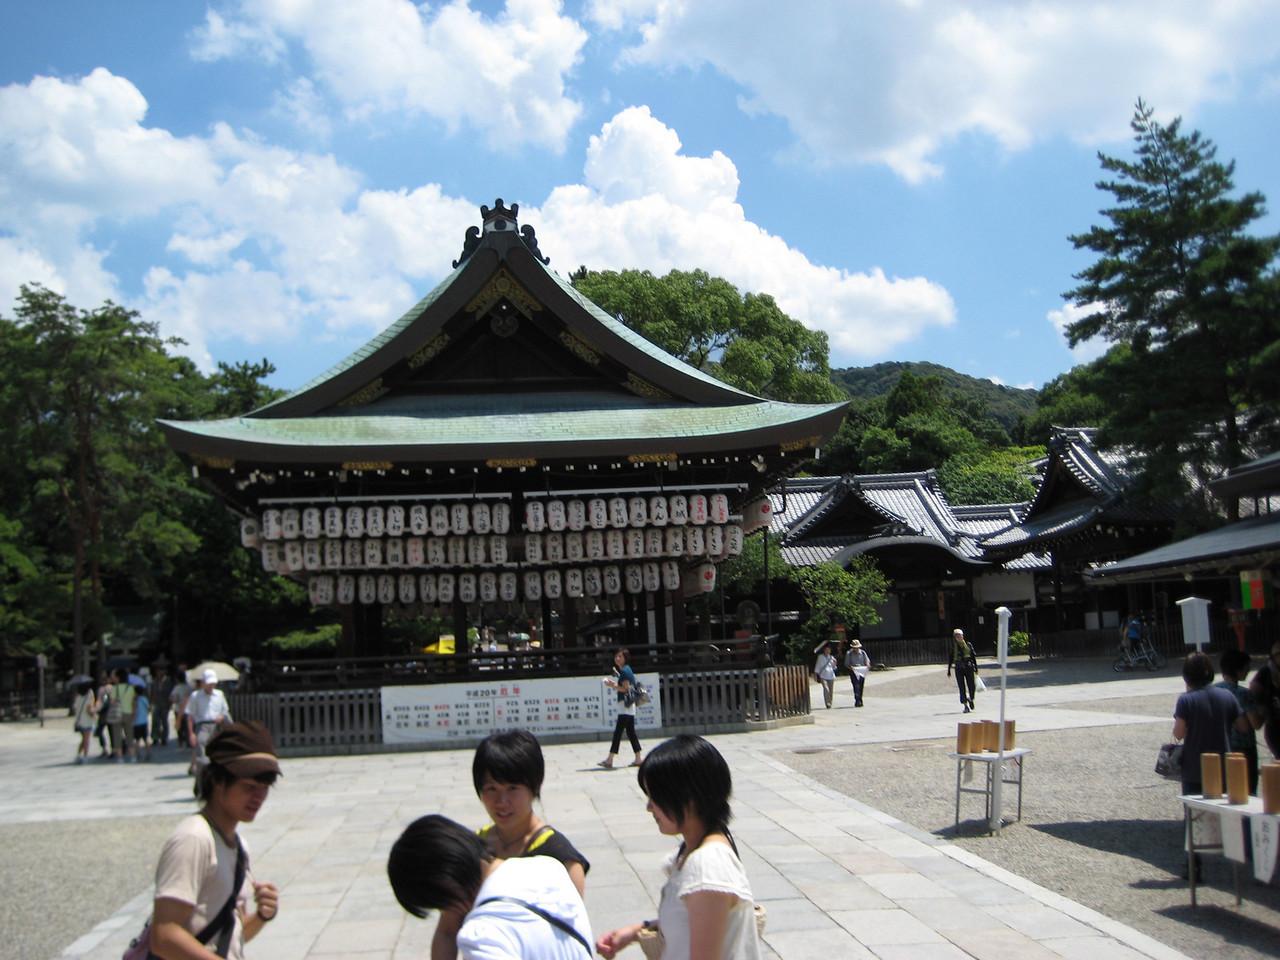 We reach the center of the Yasaka Shrine